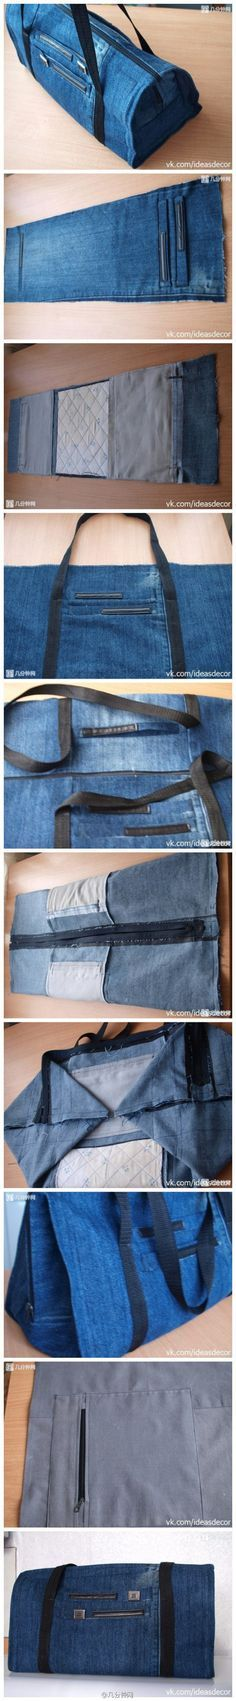 jeans bag                                                       …                                                                                                                                                                                 More